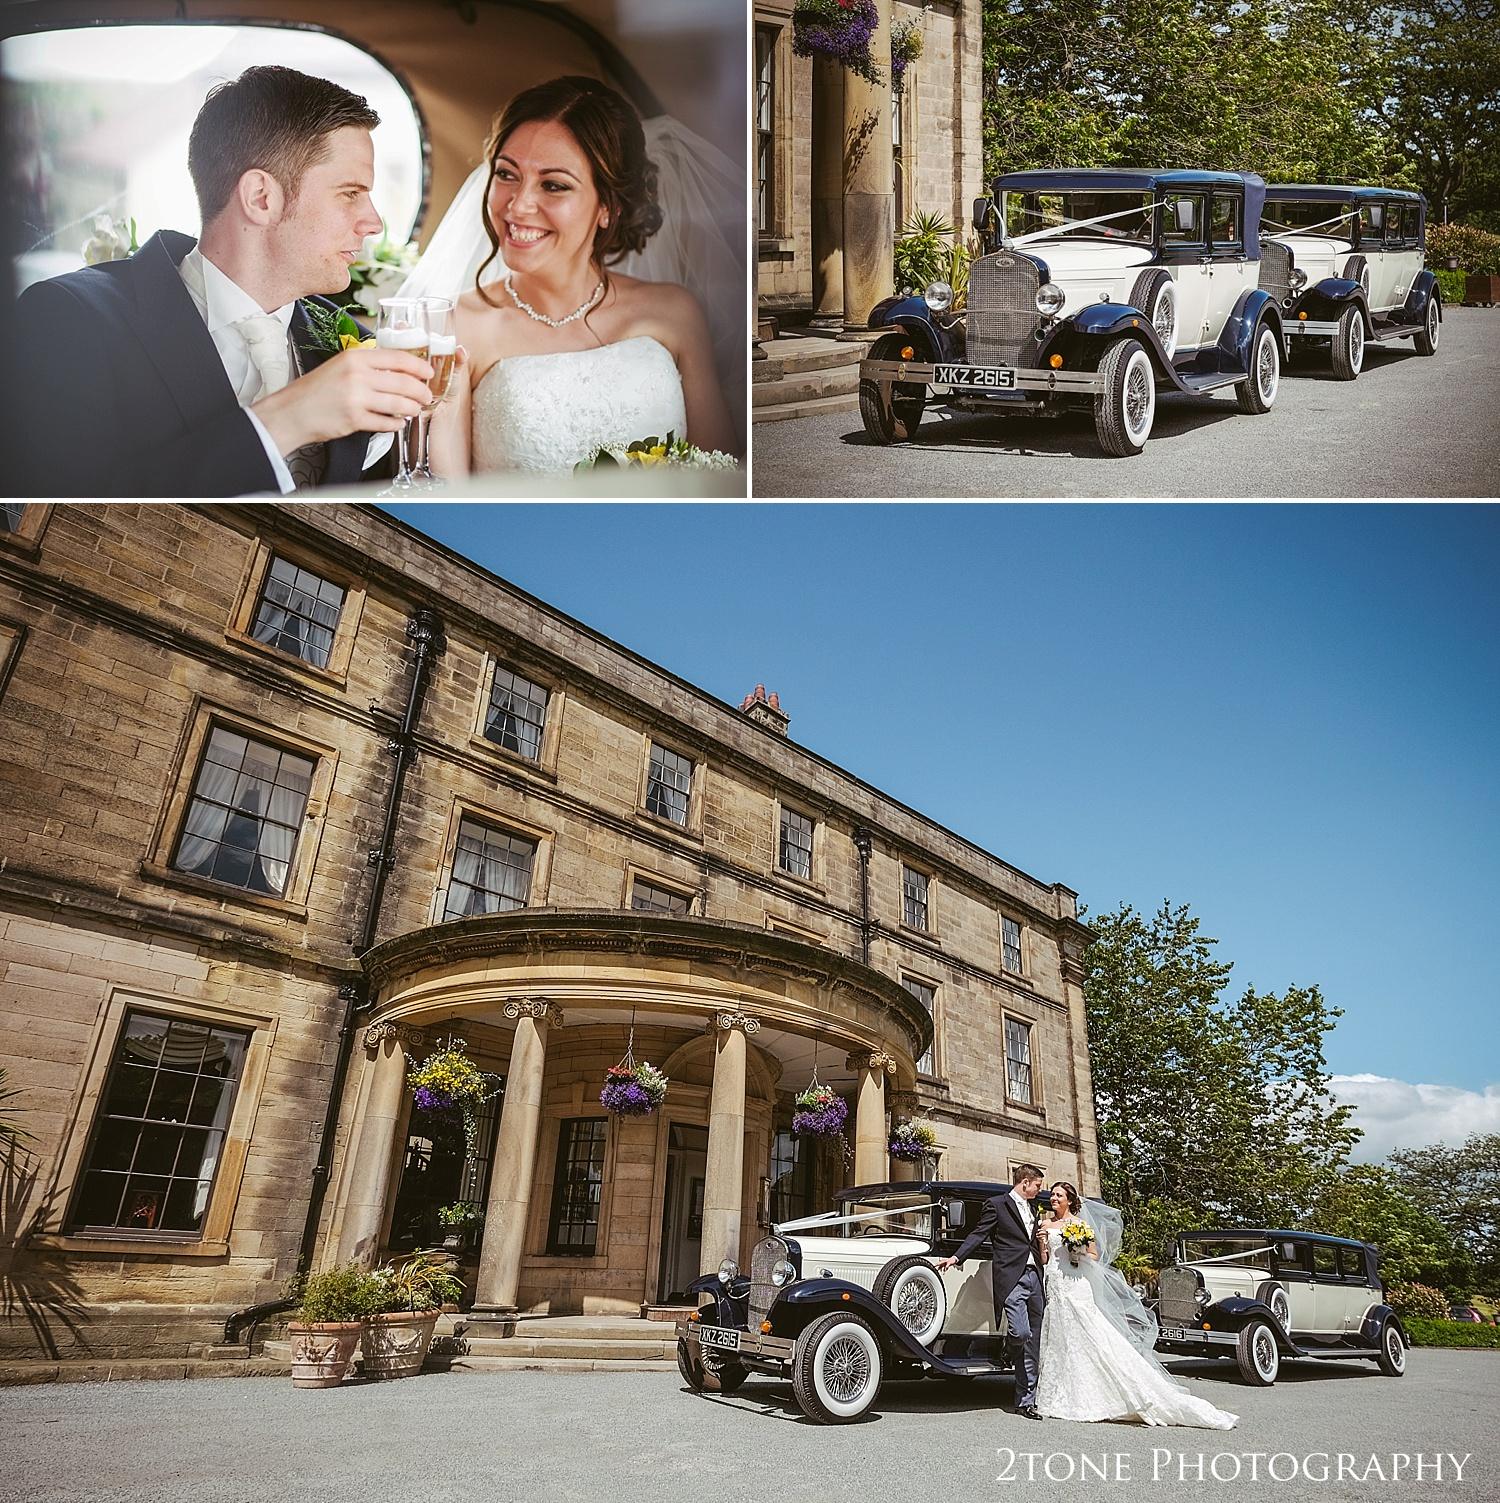 Beamish Hall wedding photography by Wedding Photographers based in Durham, www.2tonephotography.co.uk